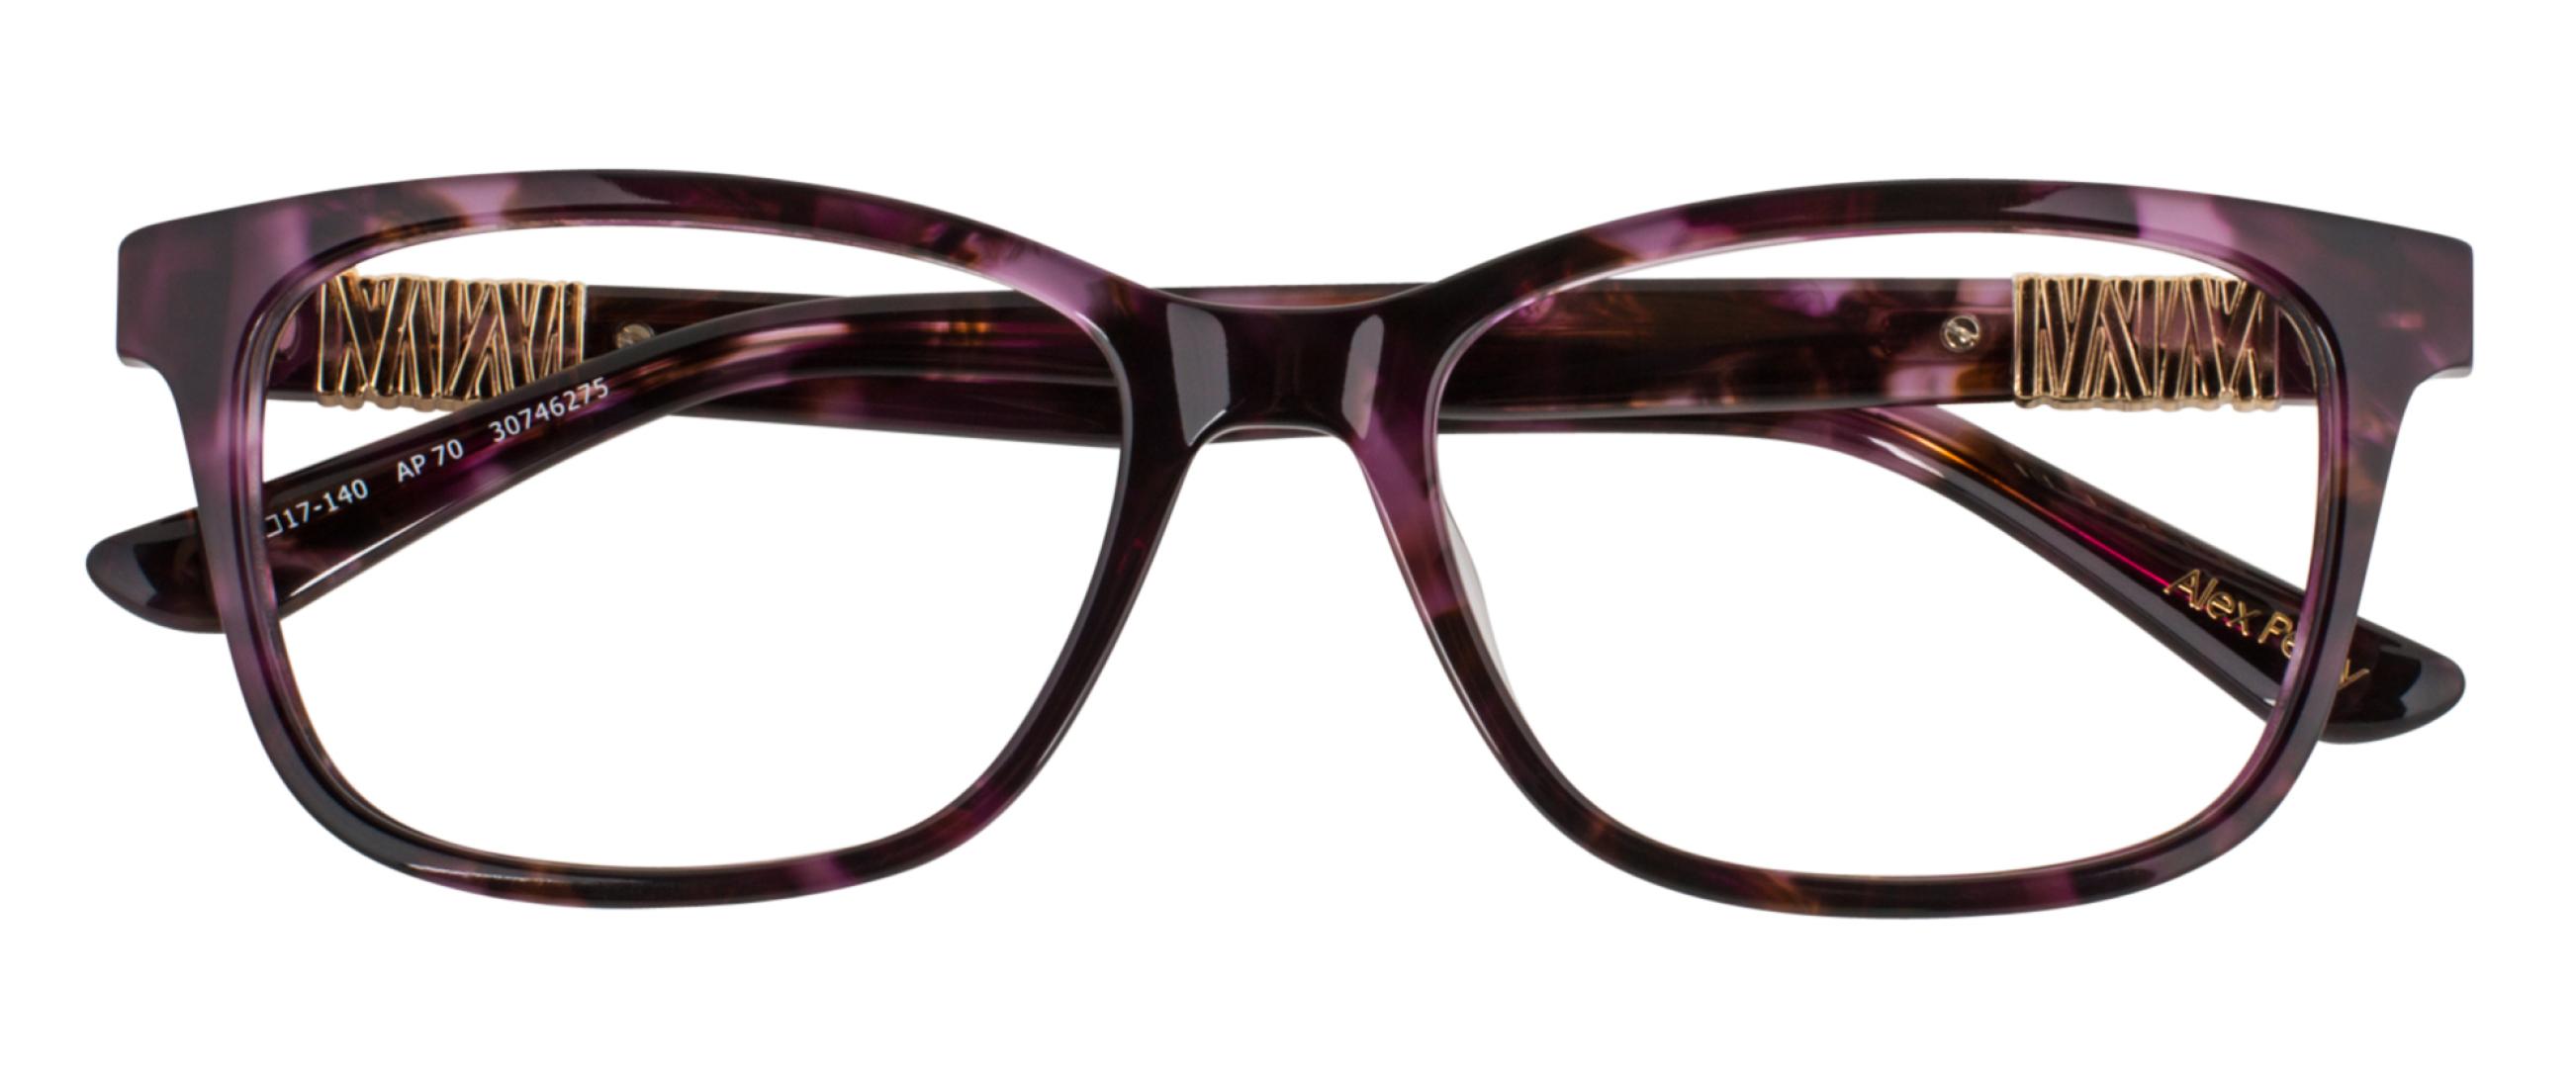 bf387104d3 Alex Perry Eyewear –  LoveGlasses